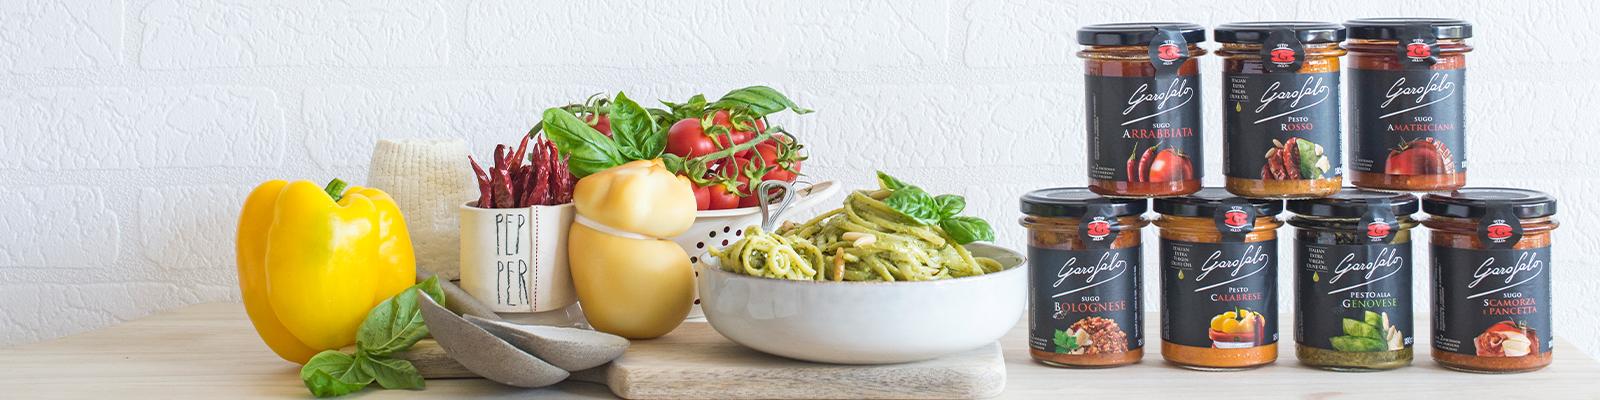 Pasta Garofalo - Såser